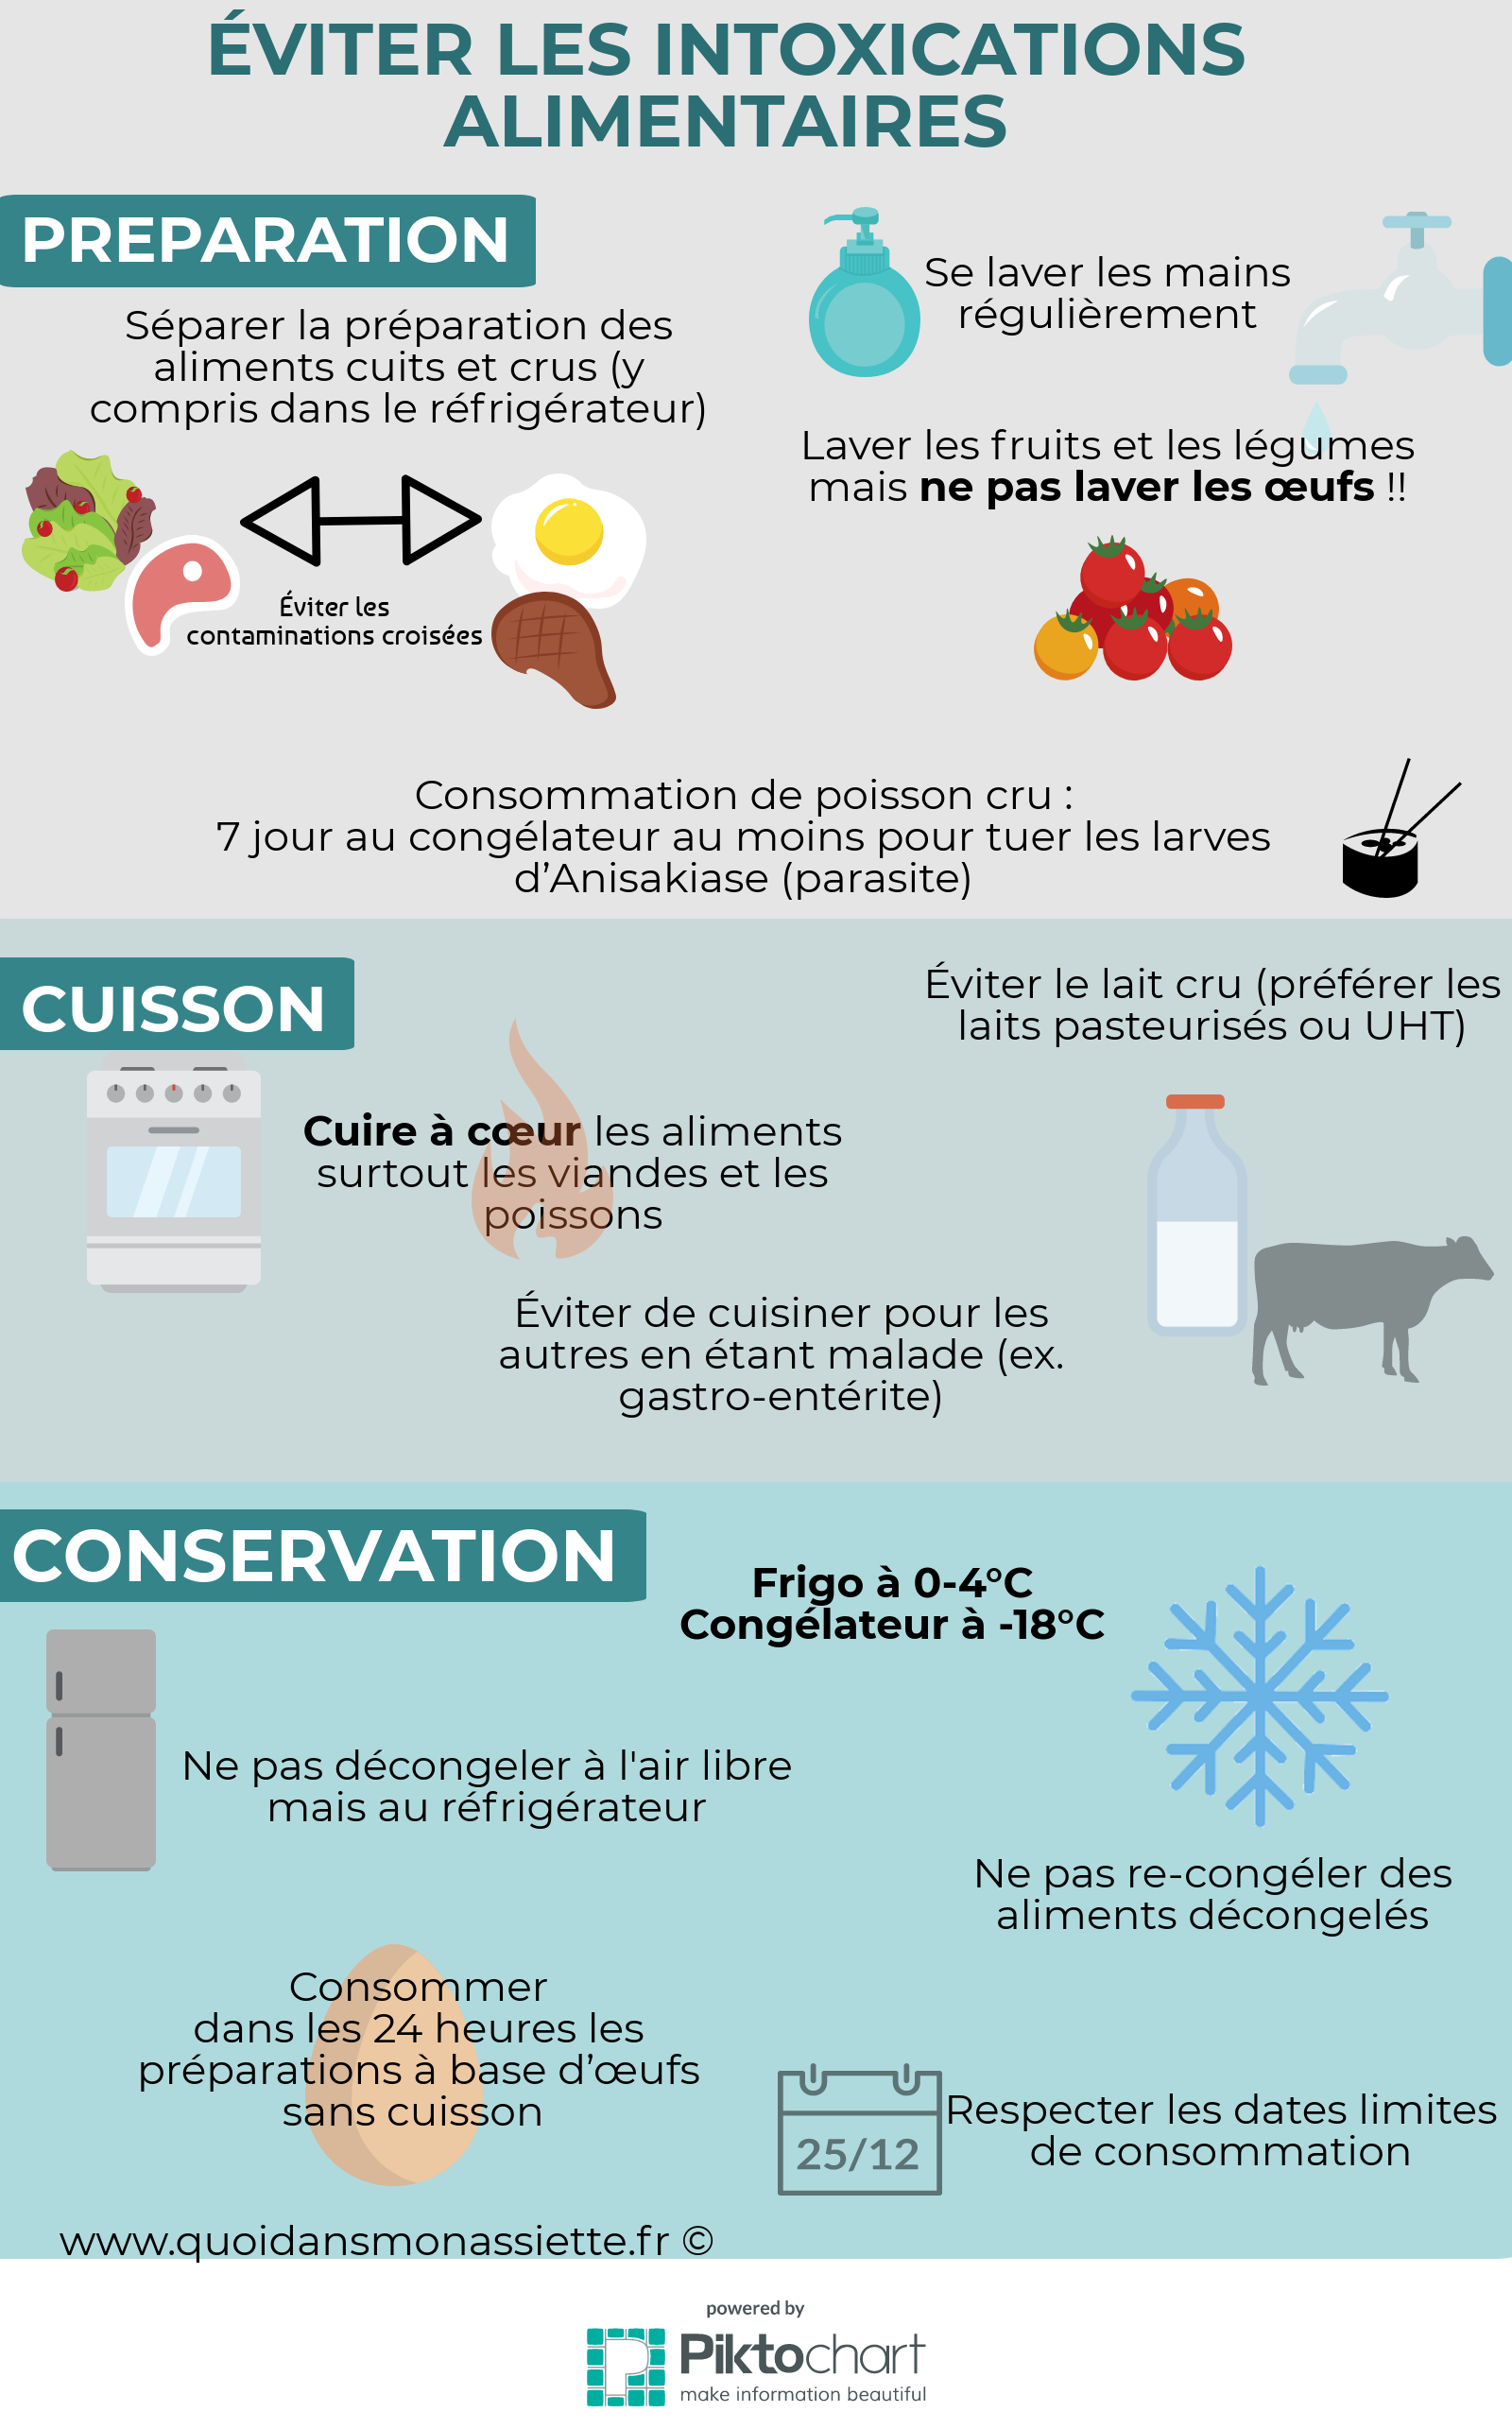 Eviter intoxications alimentaires prévention infographie